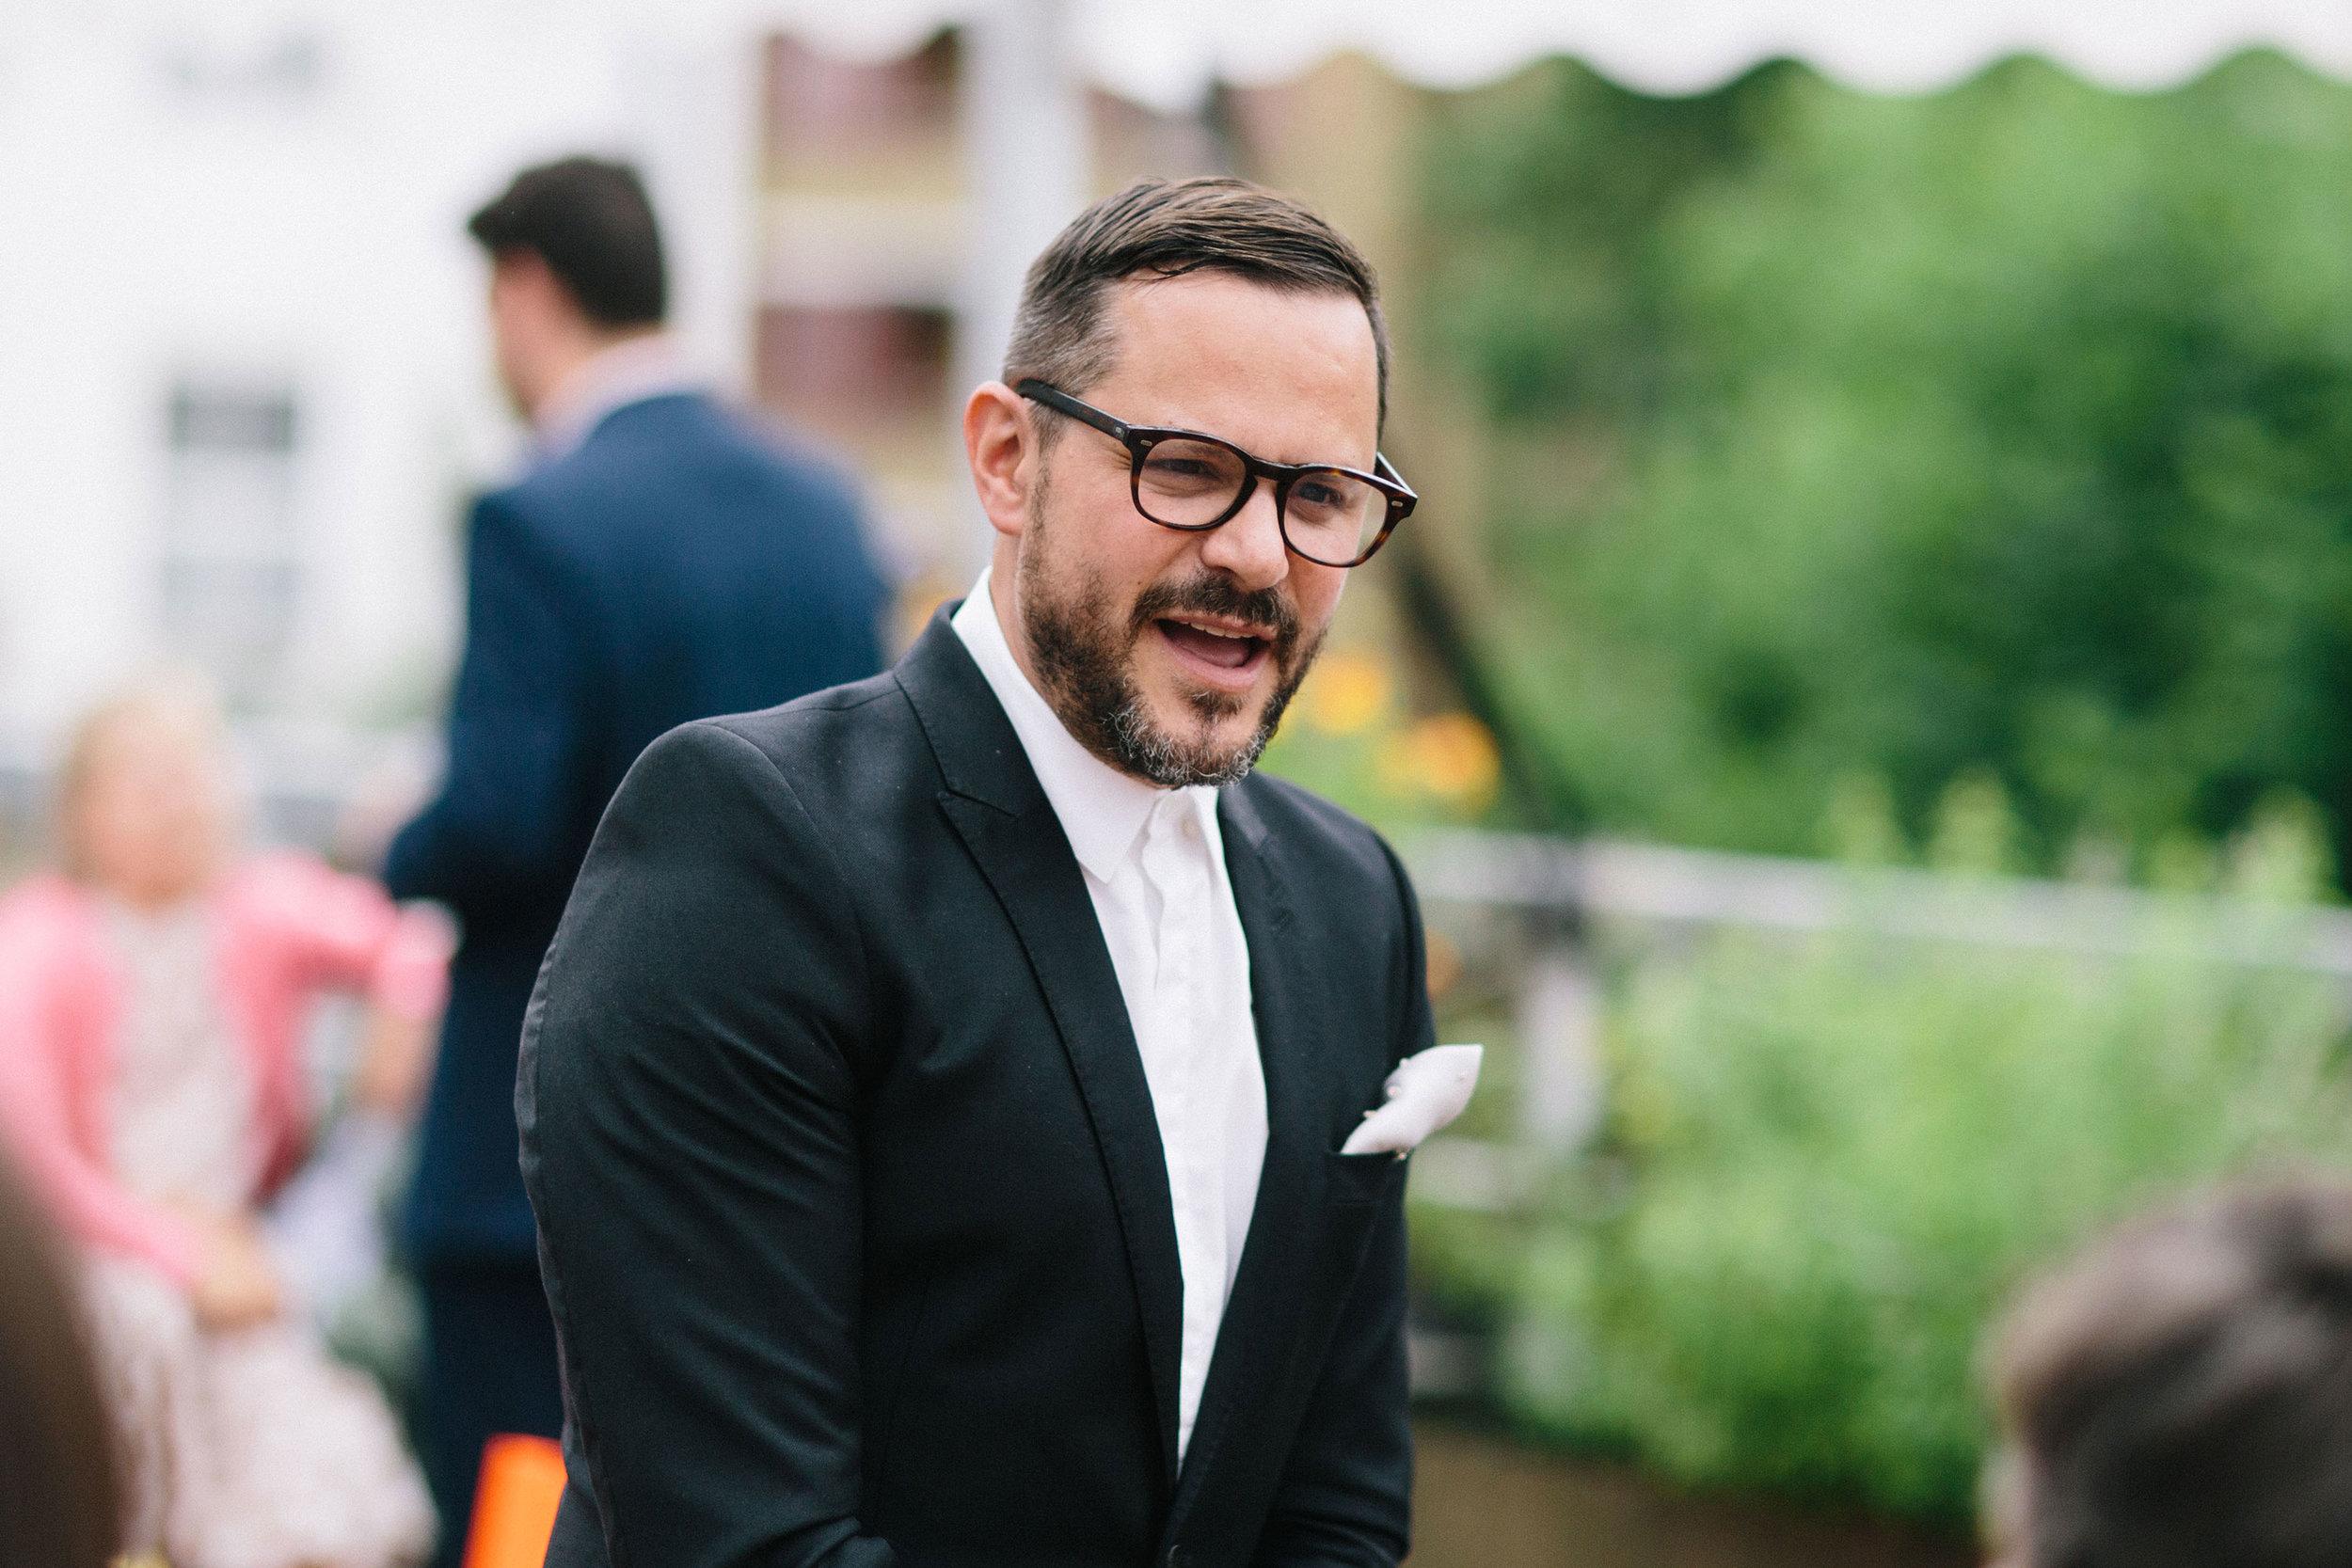 West-London-wedding-party-in-Ladbroke-Grove-Michael-Newington-Gray-14.jpg